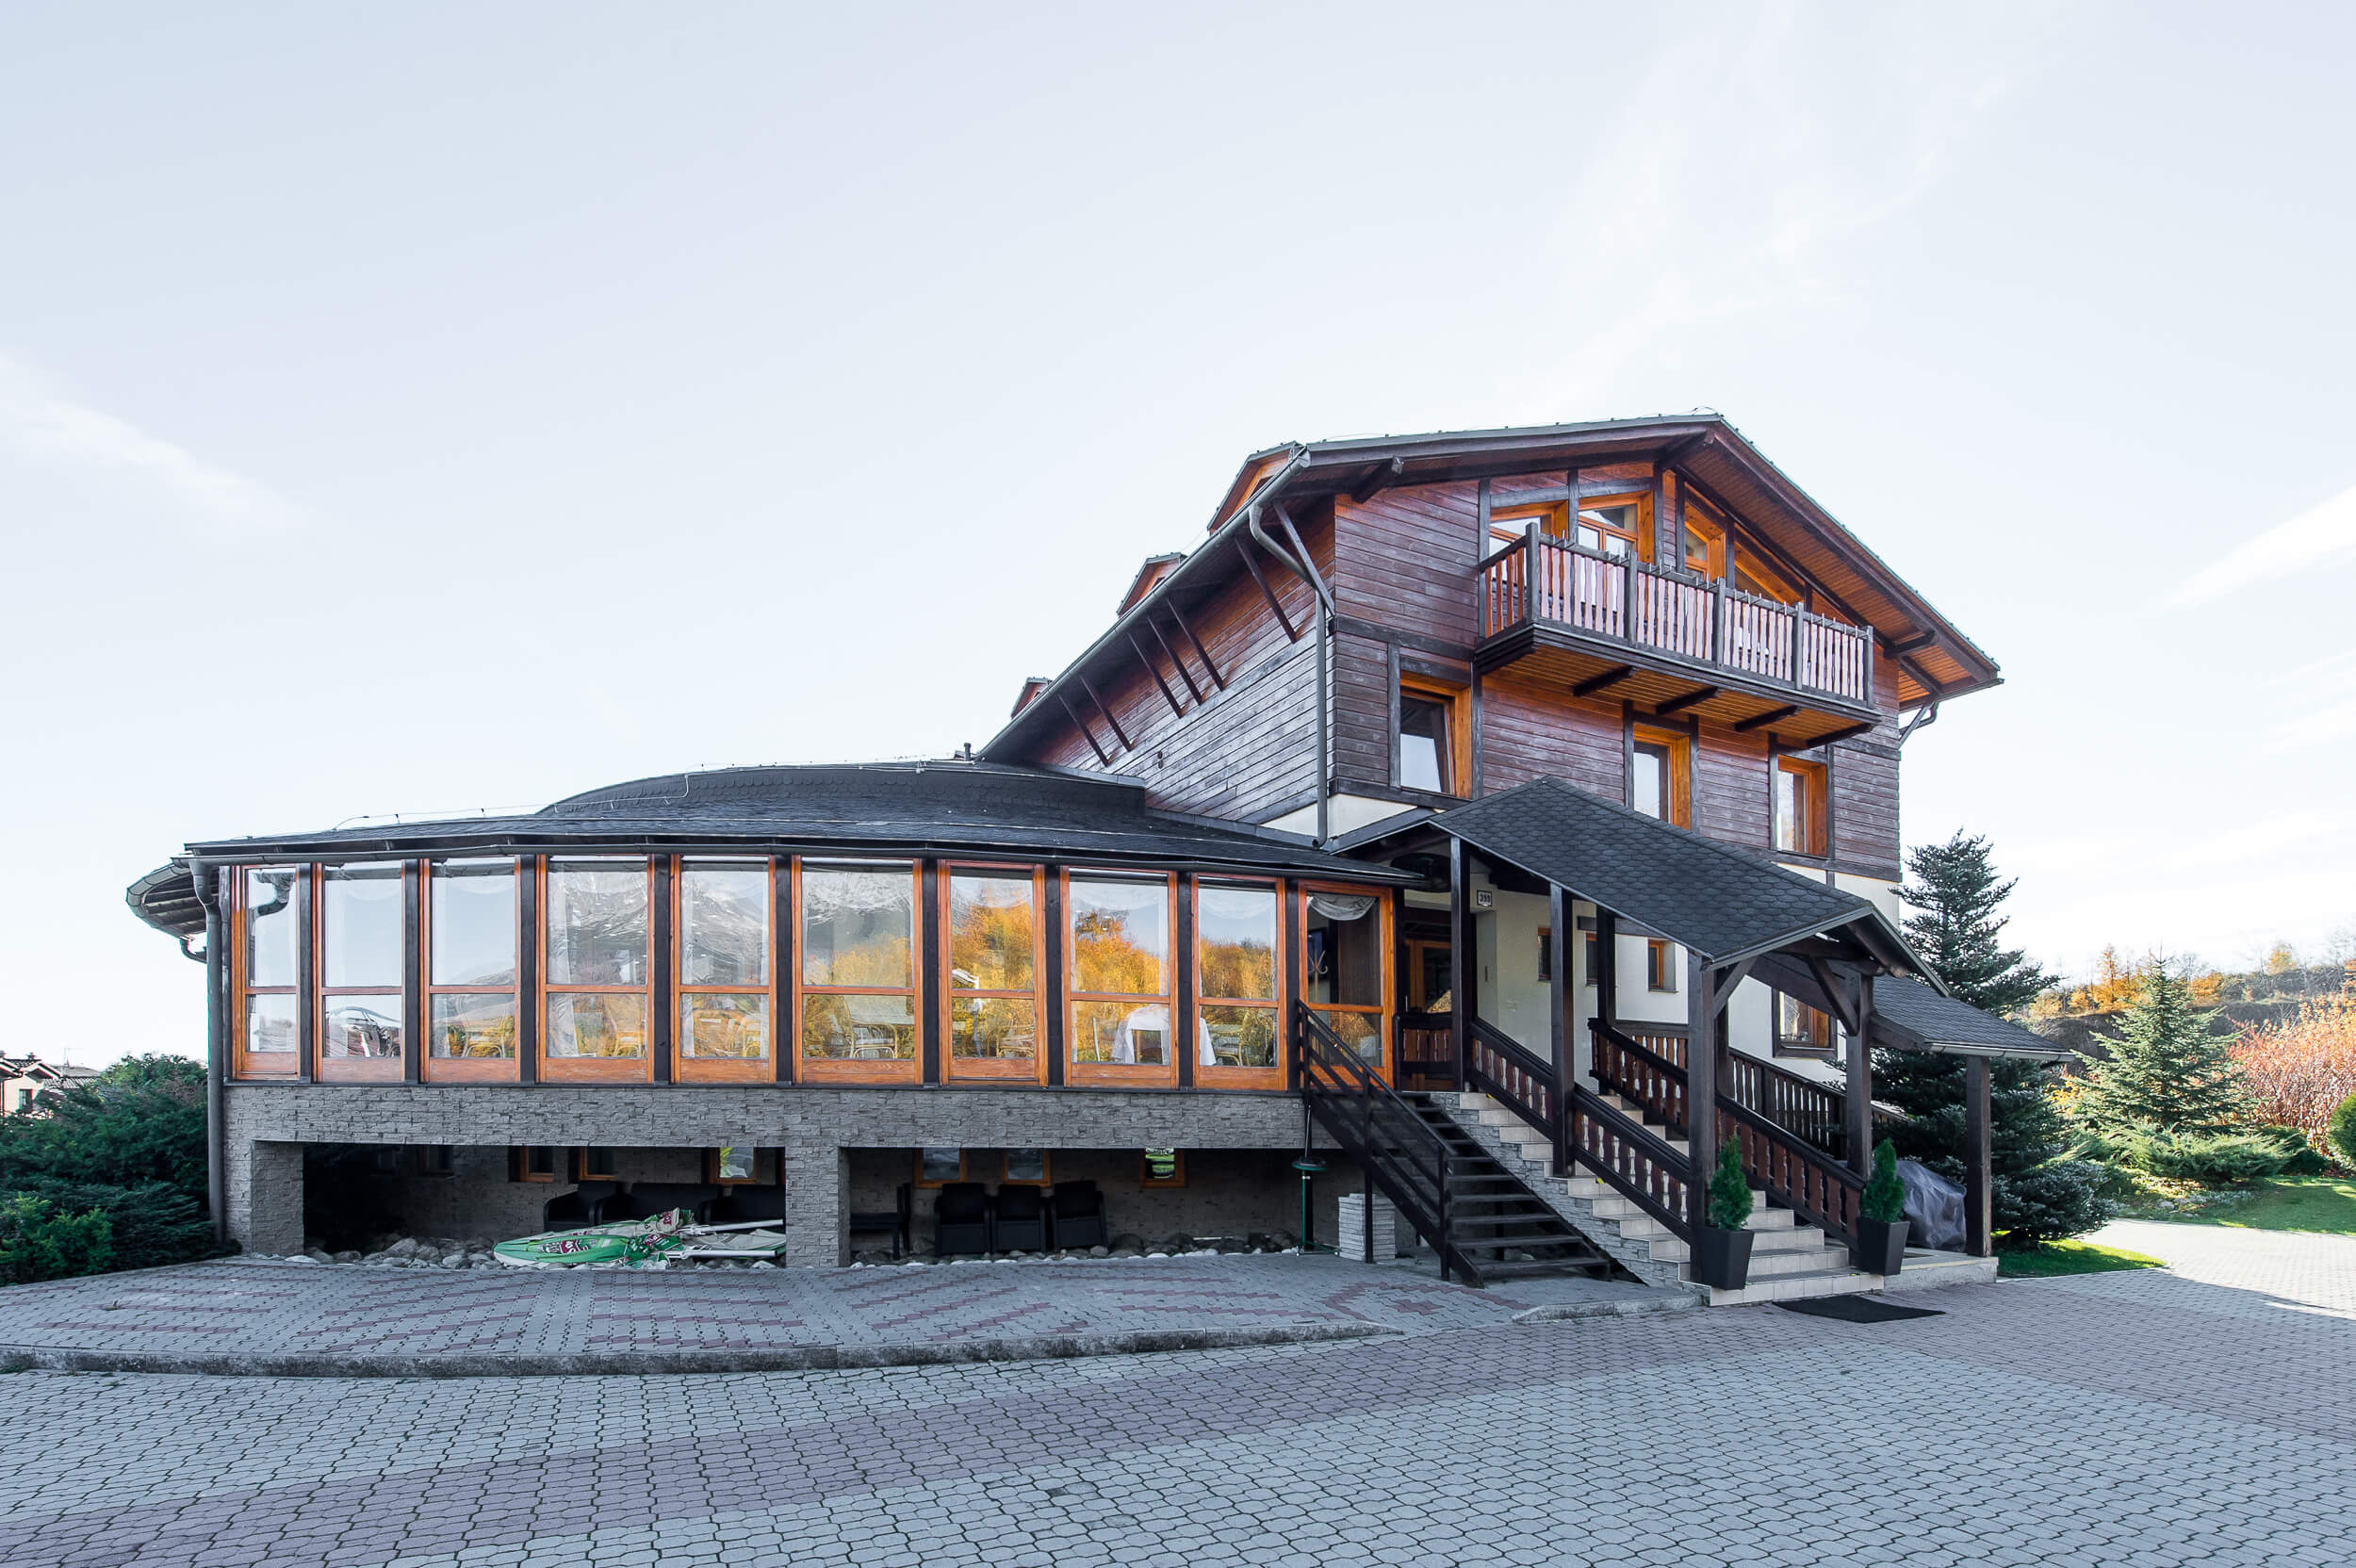 https://www.hoteleuforia.sk/sites/default/files/revslider/image/hotel-euforia-nova-lesna-vysoke-tatry--min65.jpg